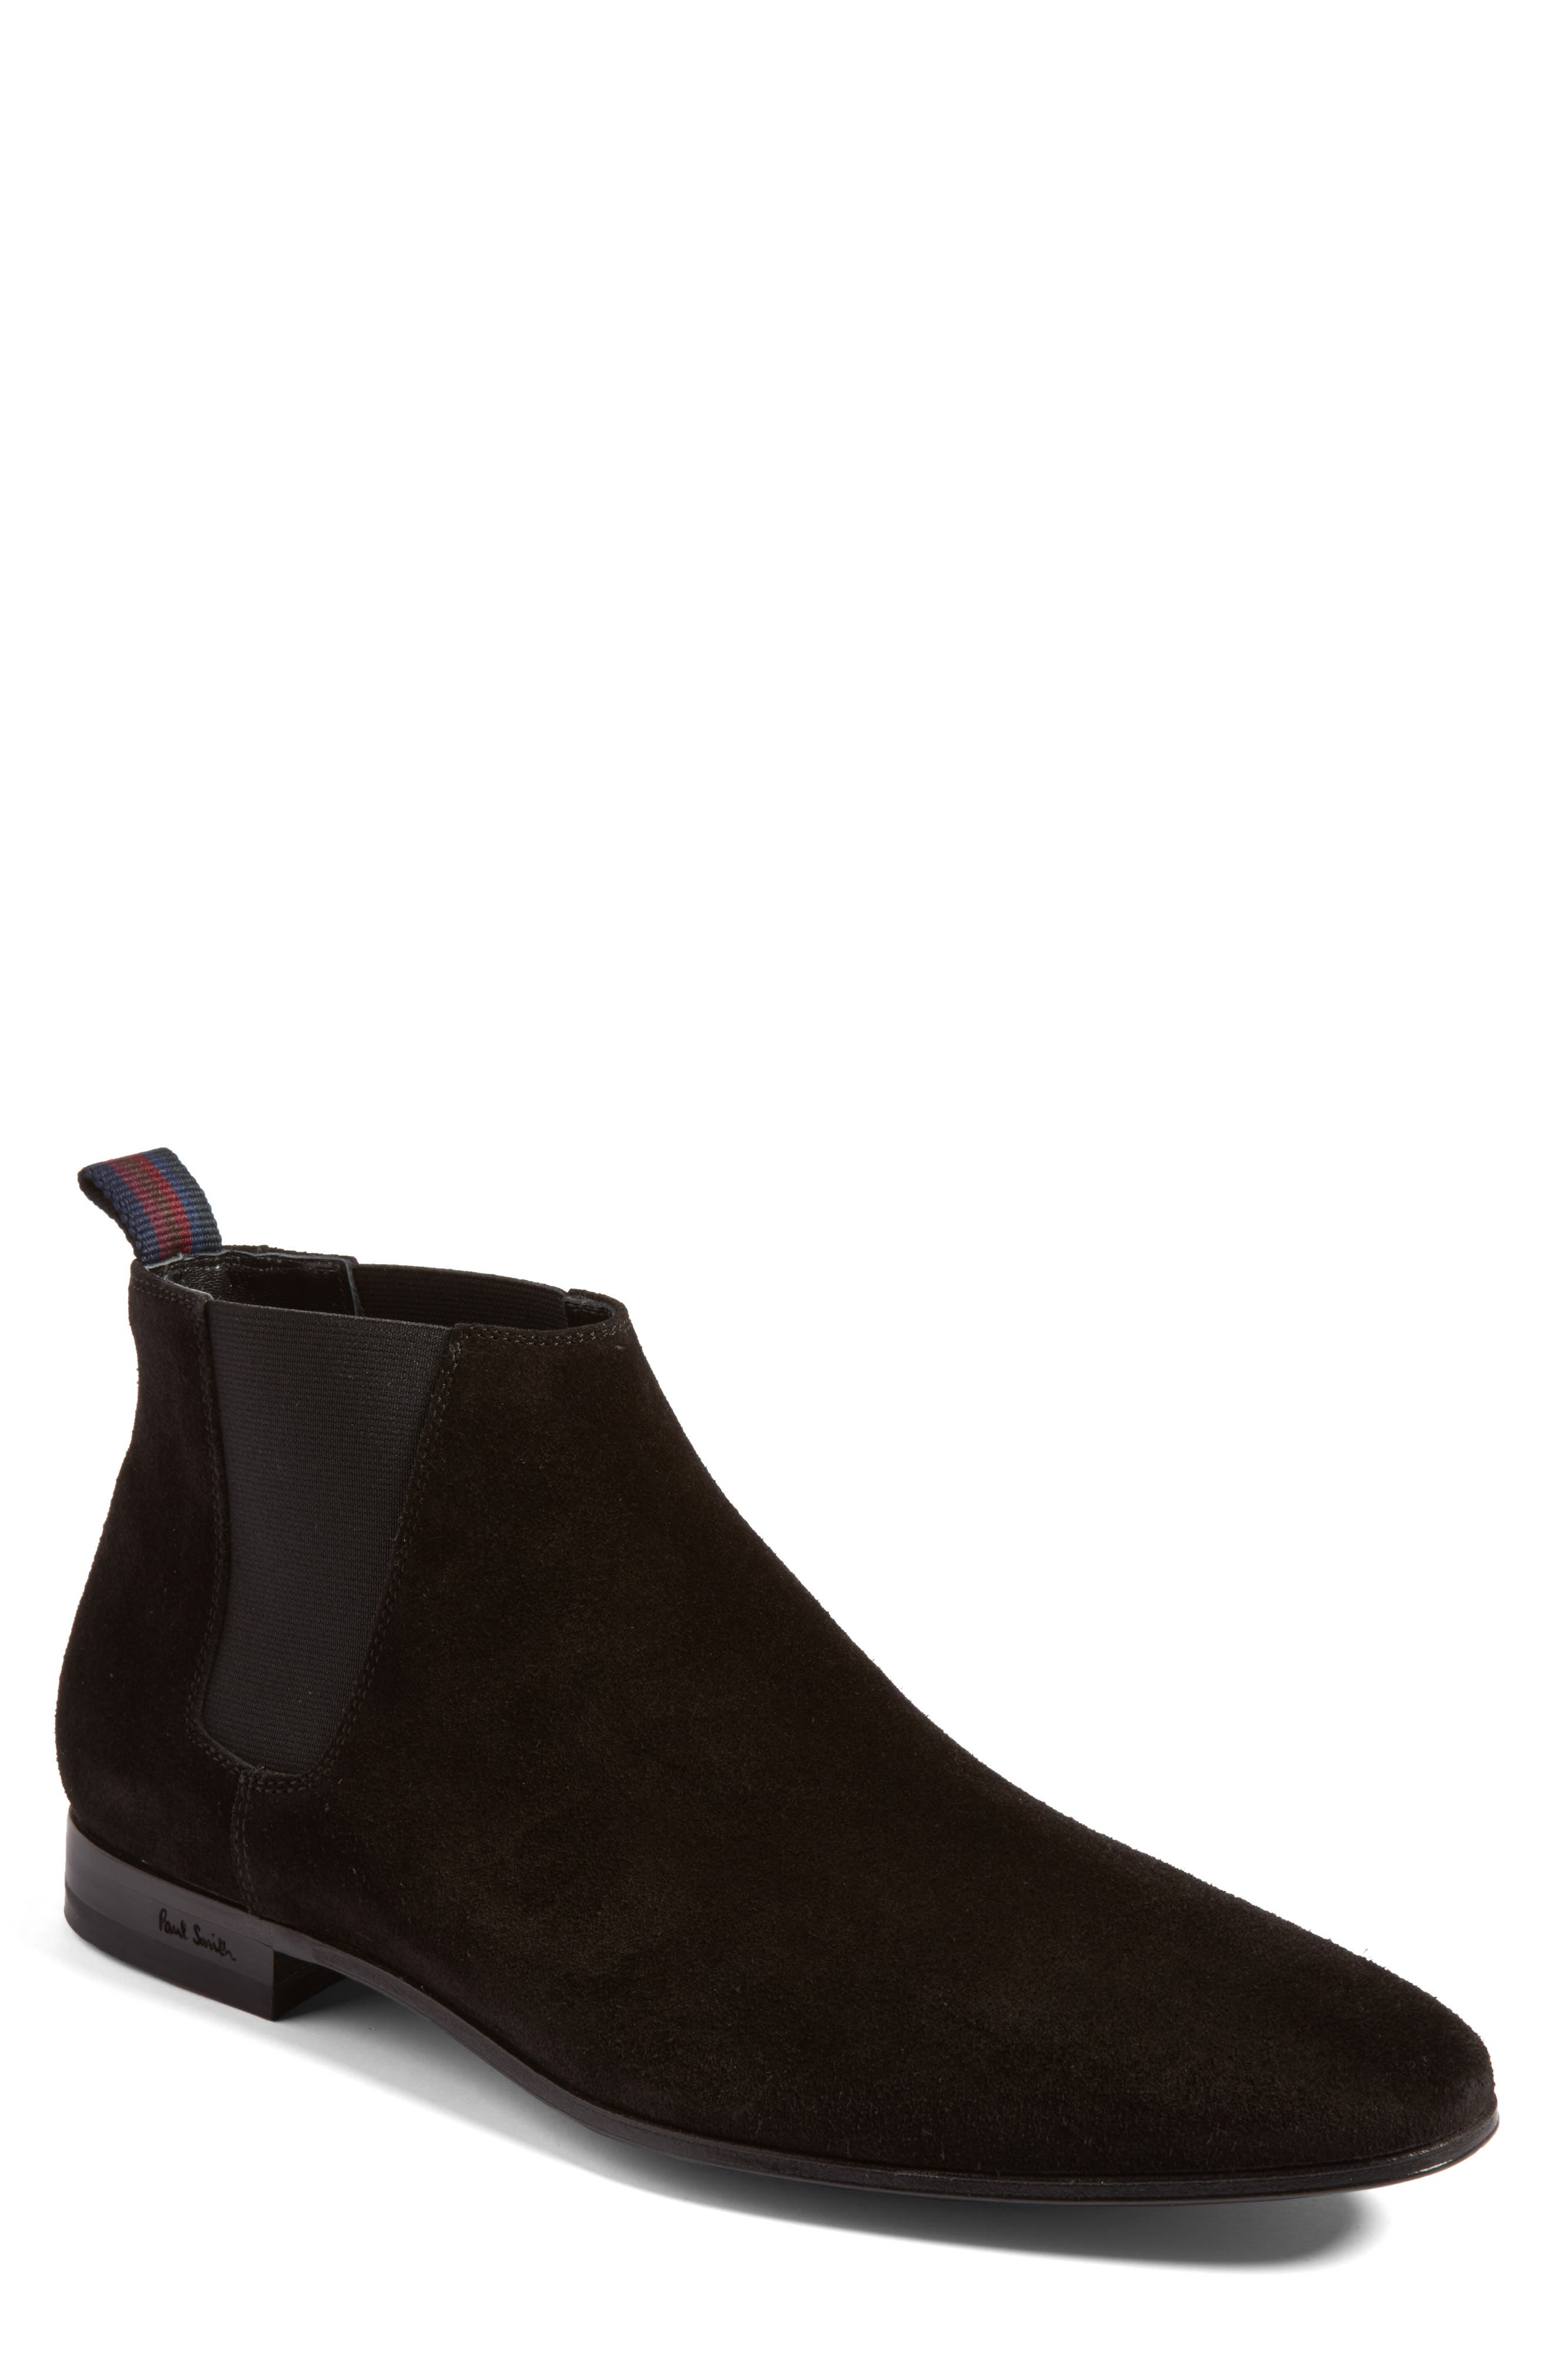 Marlowe Chelsea Boot,                         Main,                         color, 001